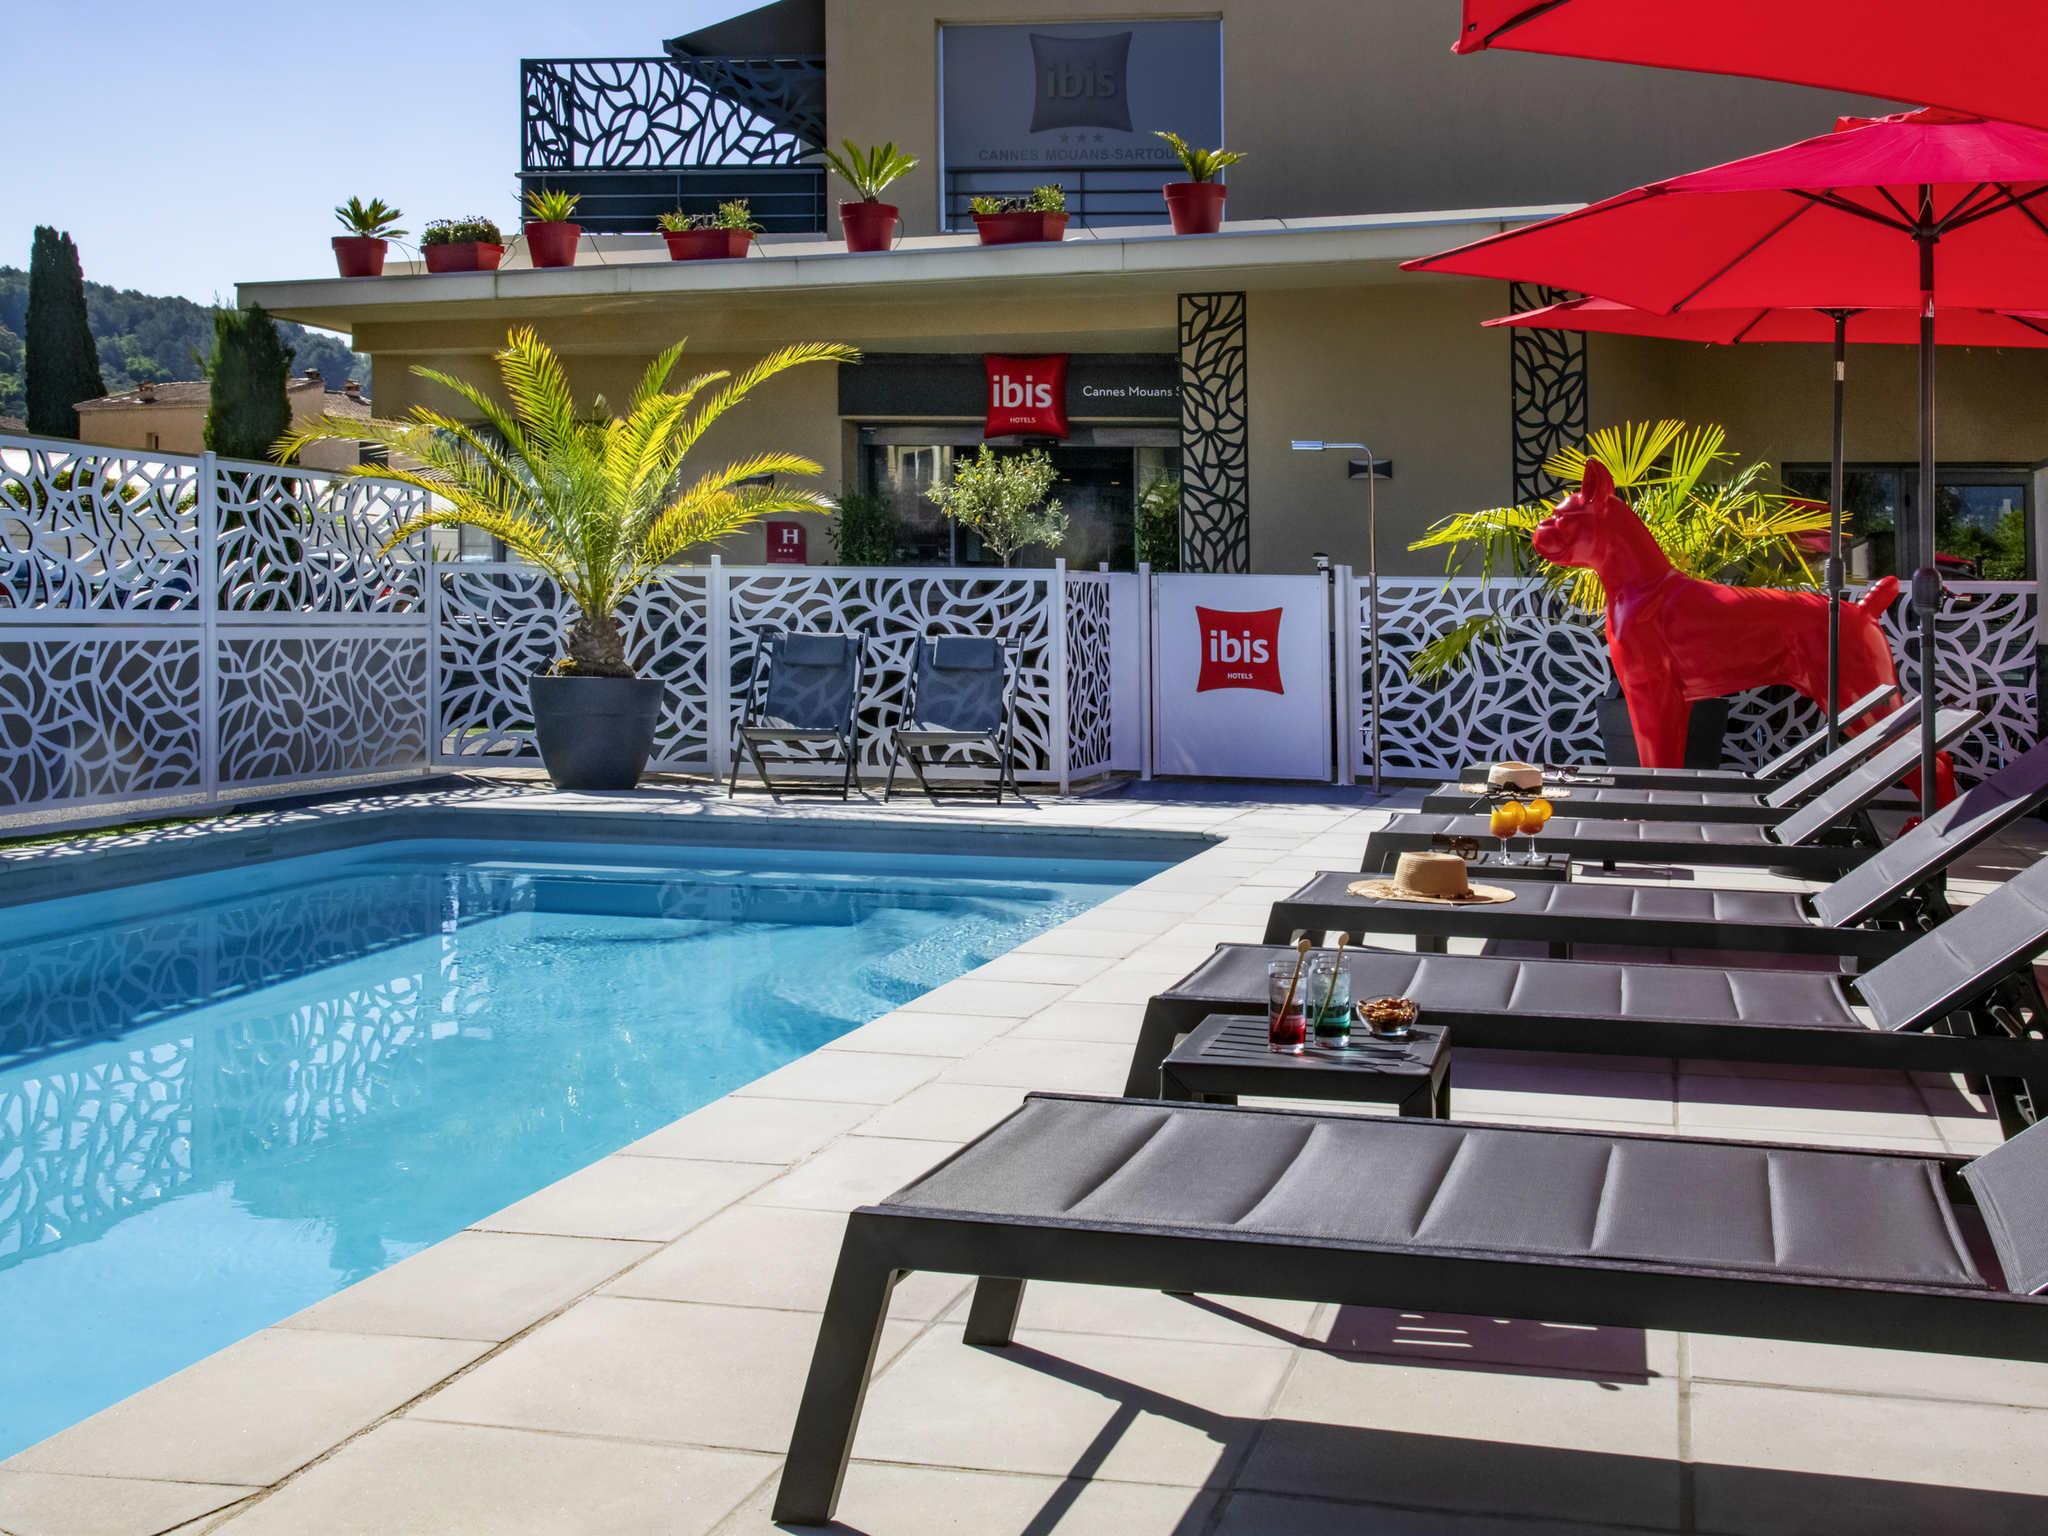 酒店 – ibis Cannes Mouans-Sartoux